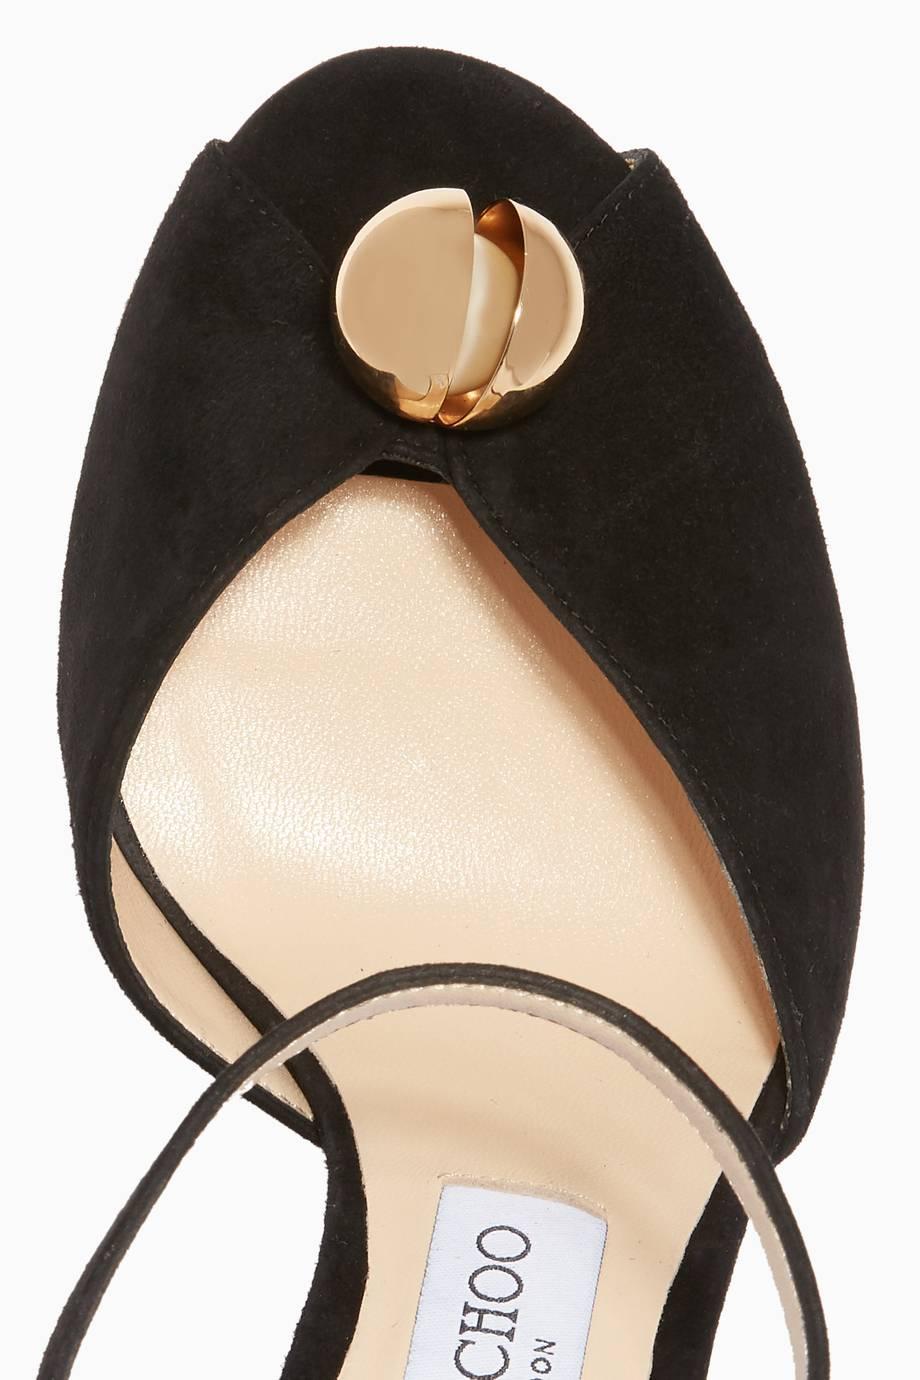 a7550fbf945 Shop Luxury Jimmy Choo Black Sacora Suede Sandals